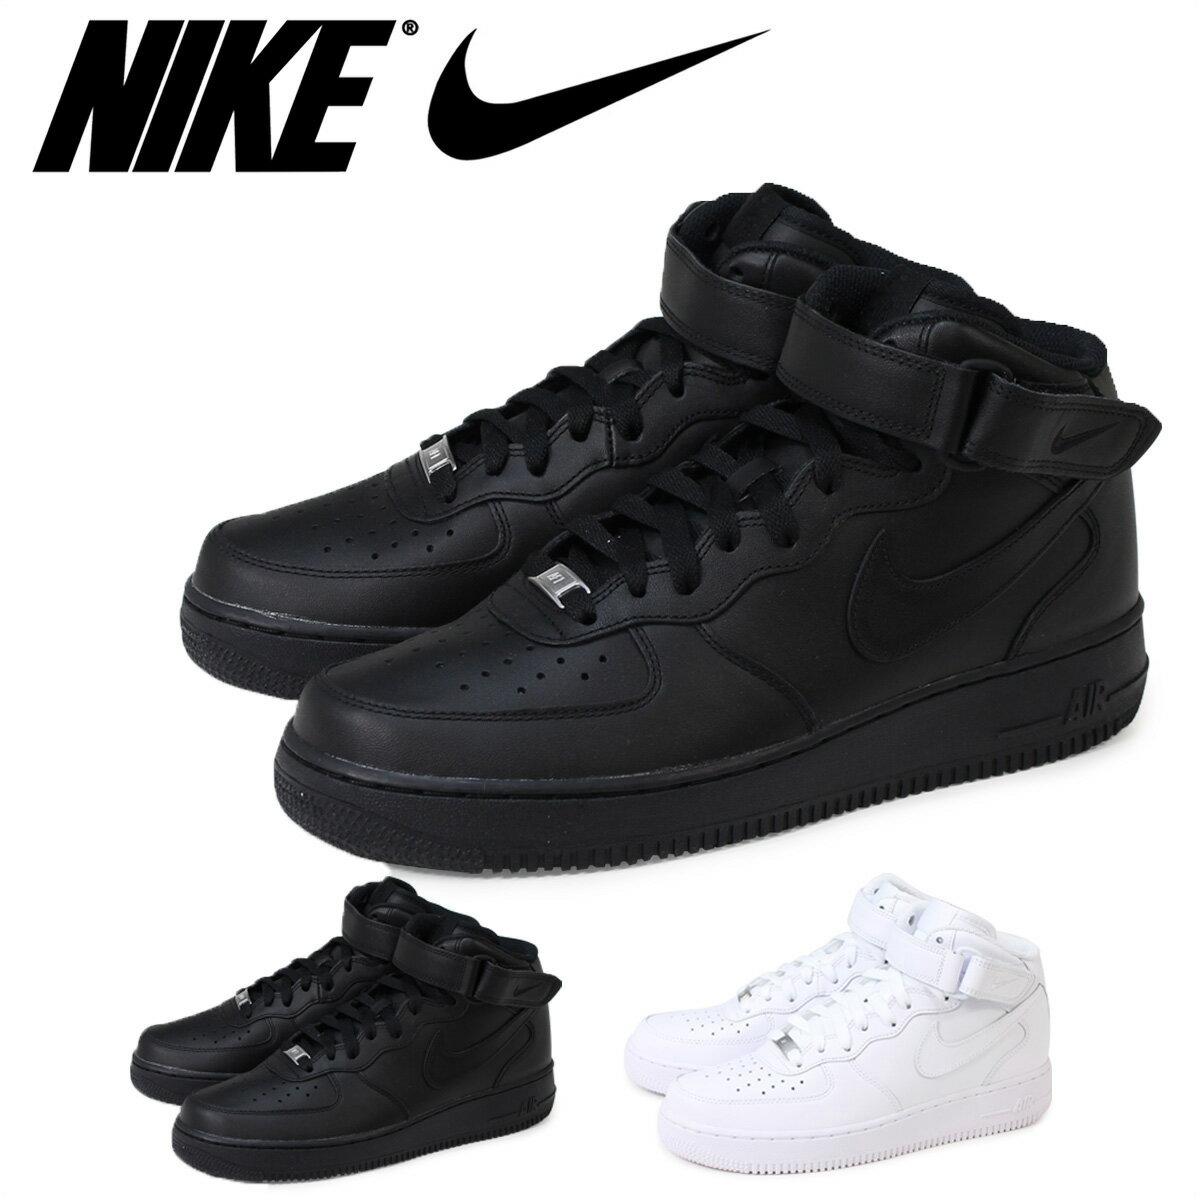 NIKE AIR FORCE 1 MID ナイキ エアフォース1 スニーカー エア フォース 1 ミッド 315123-001 315123-111 メンズ 靴 ブラック ホワイト [12/27 追加入荷][1712]